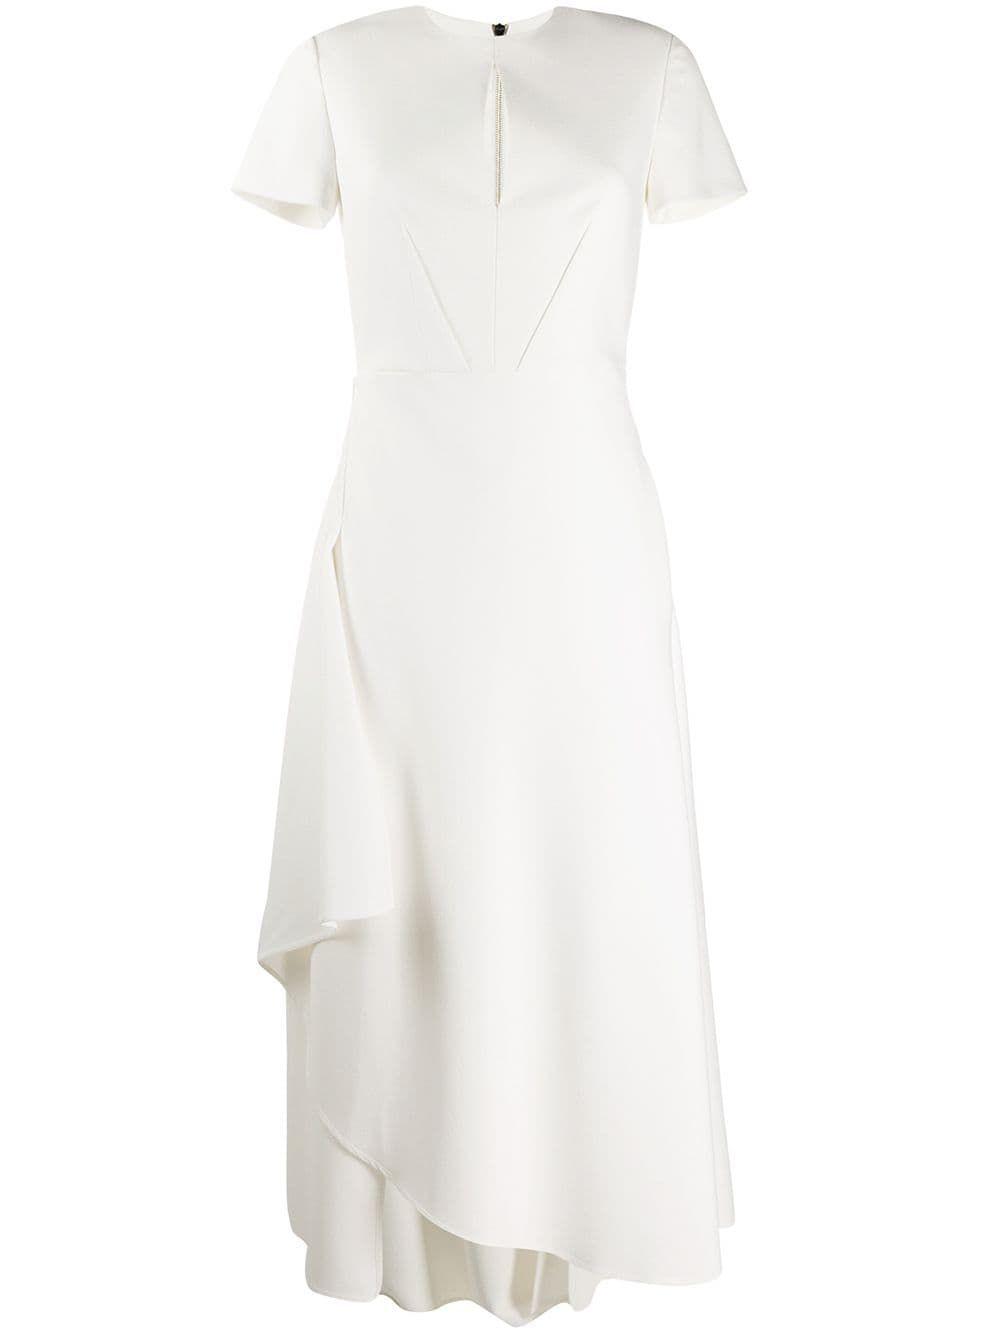 Roland Mouret Ardmore Dress White Dresses White Dress Bodycon Dresses Uk